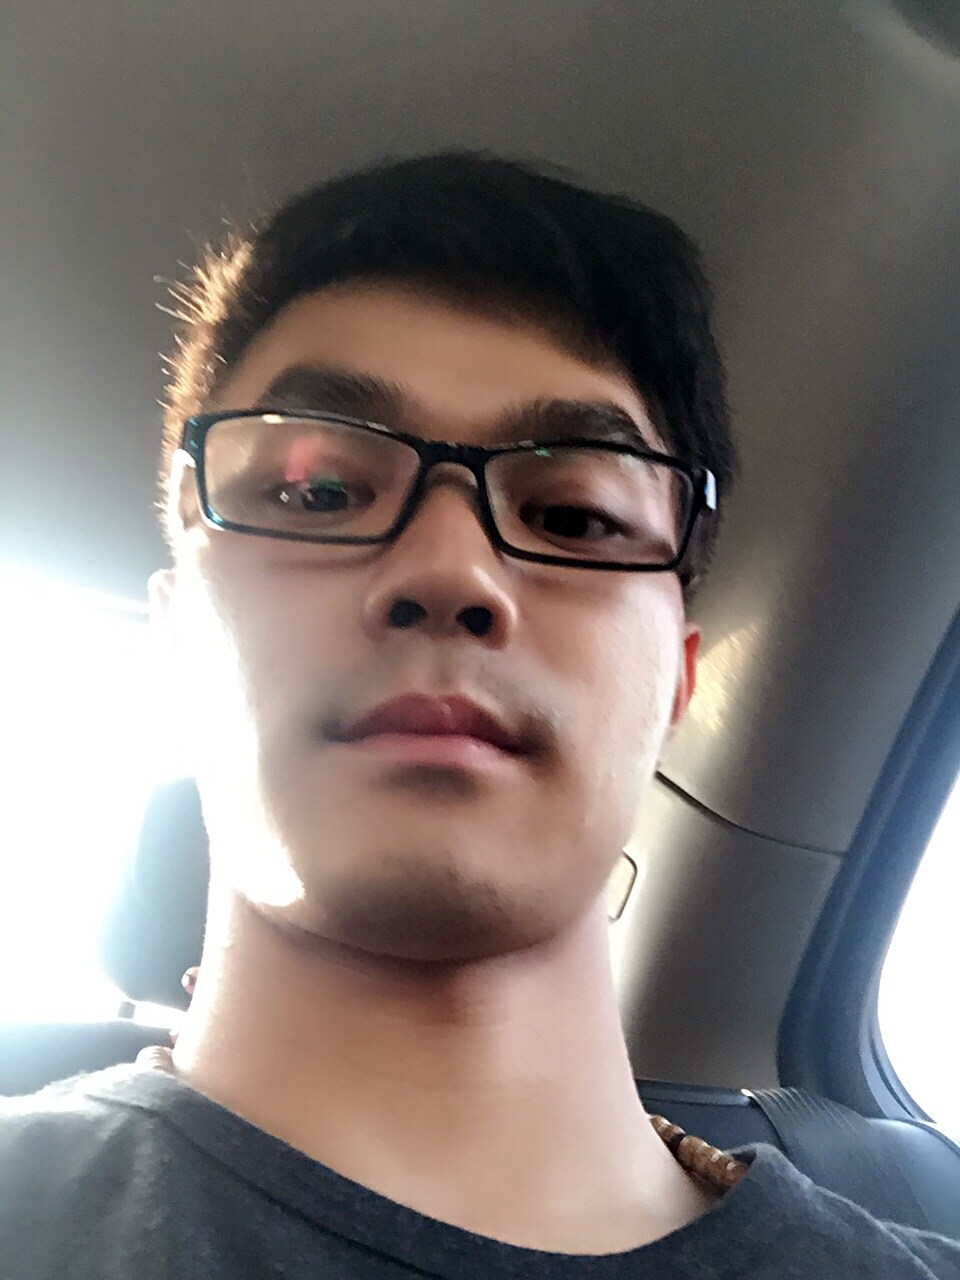 Awen from 北京